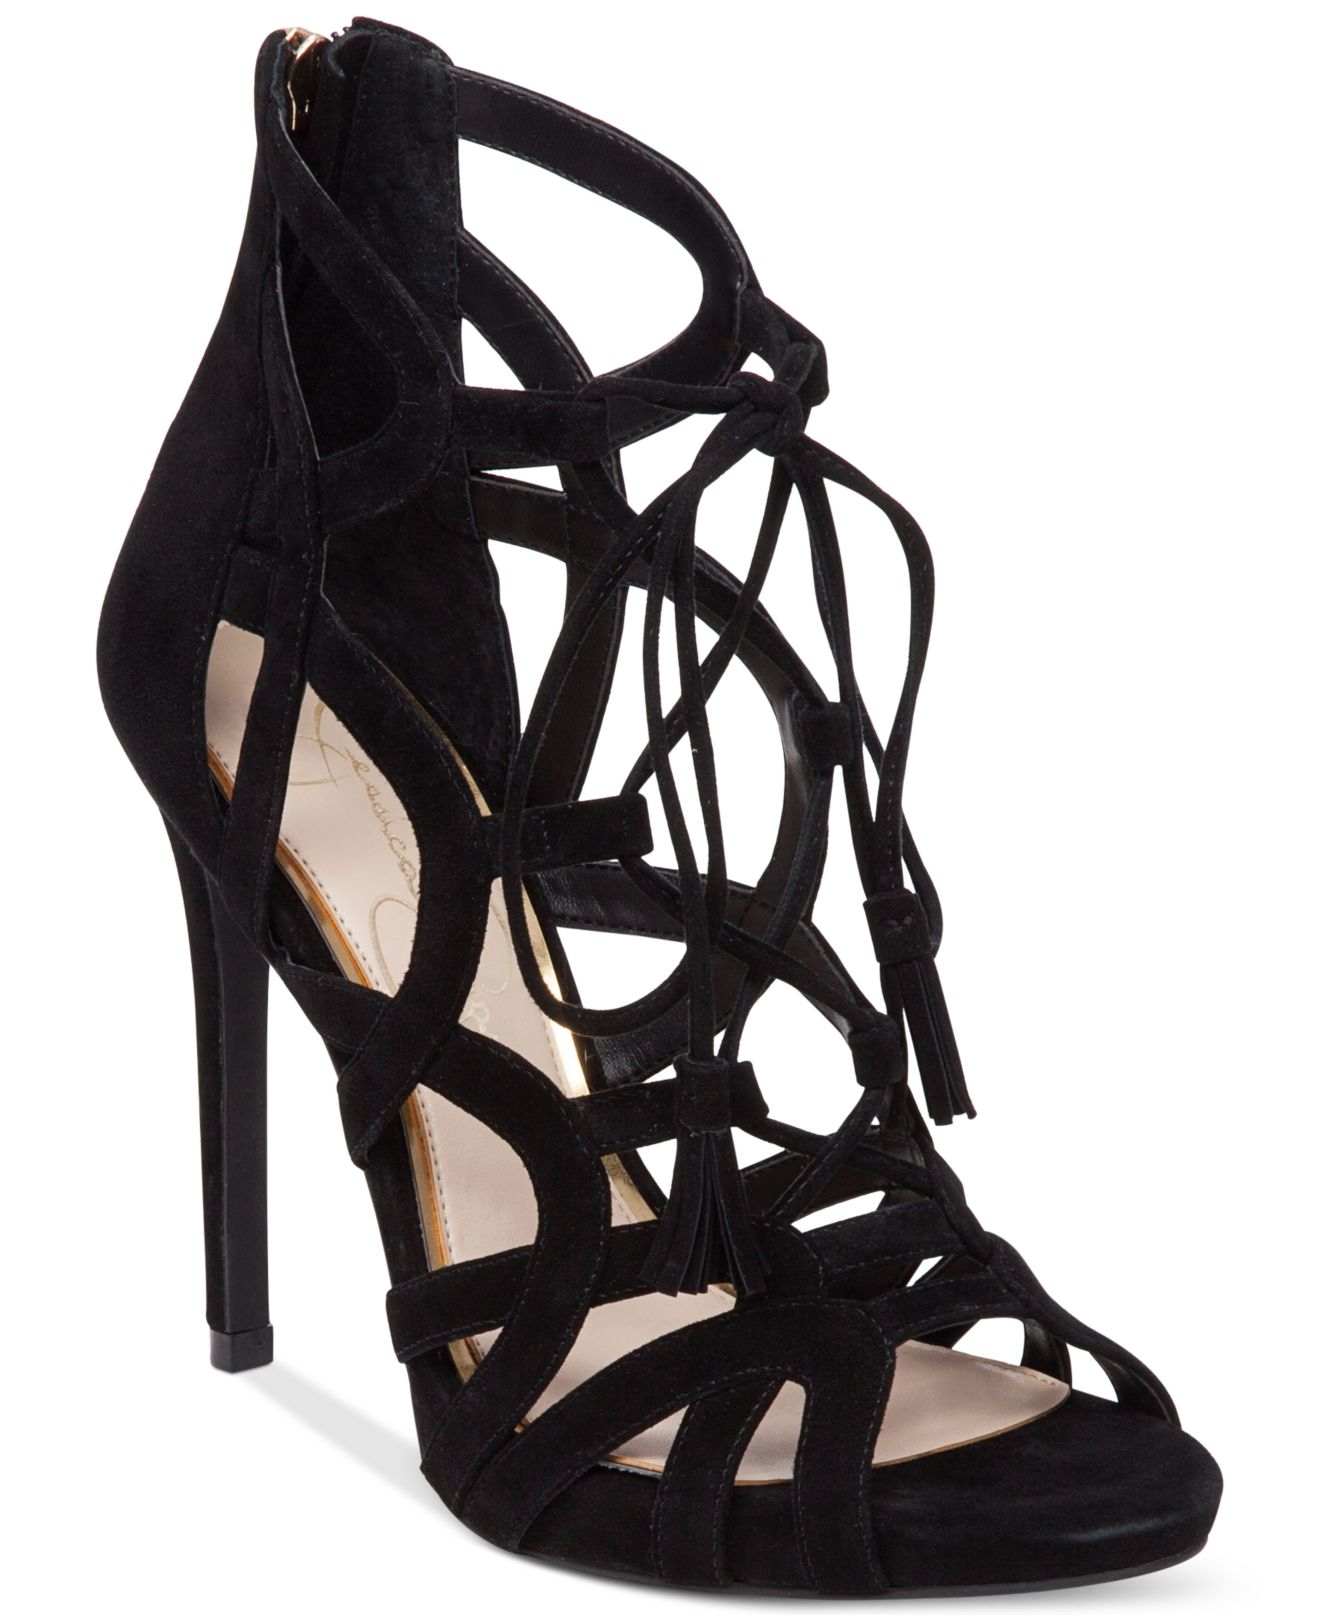 Jessica simpson Racine Lace-up High-heel Gladiator Sandals in ...